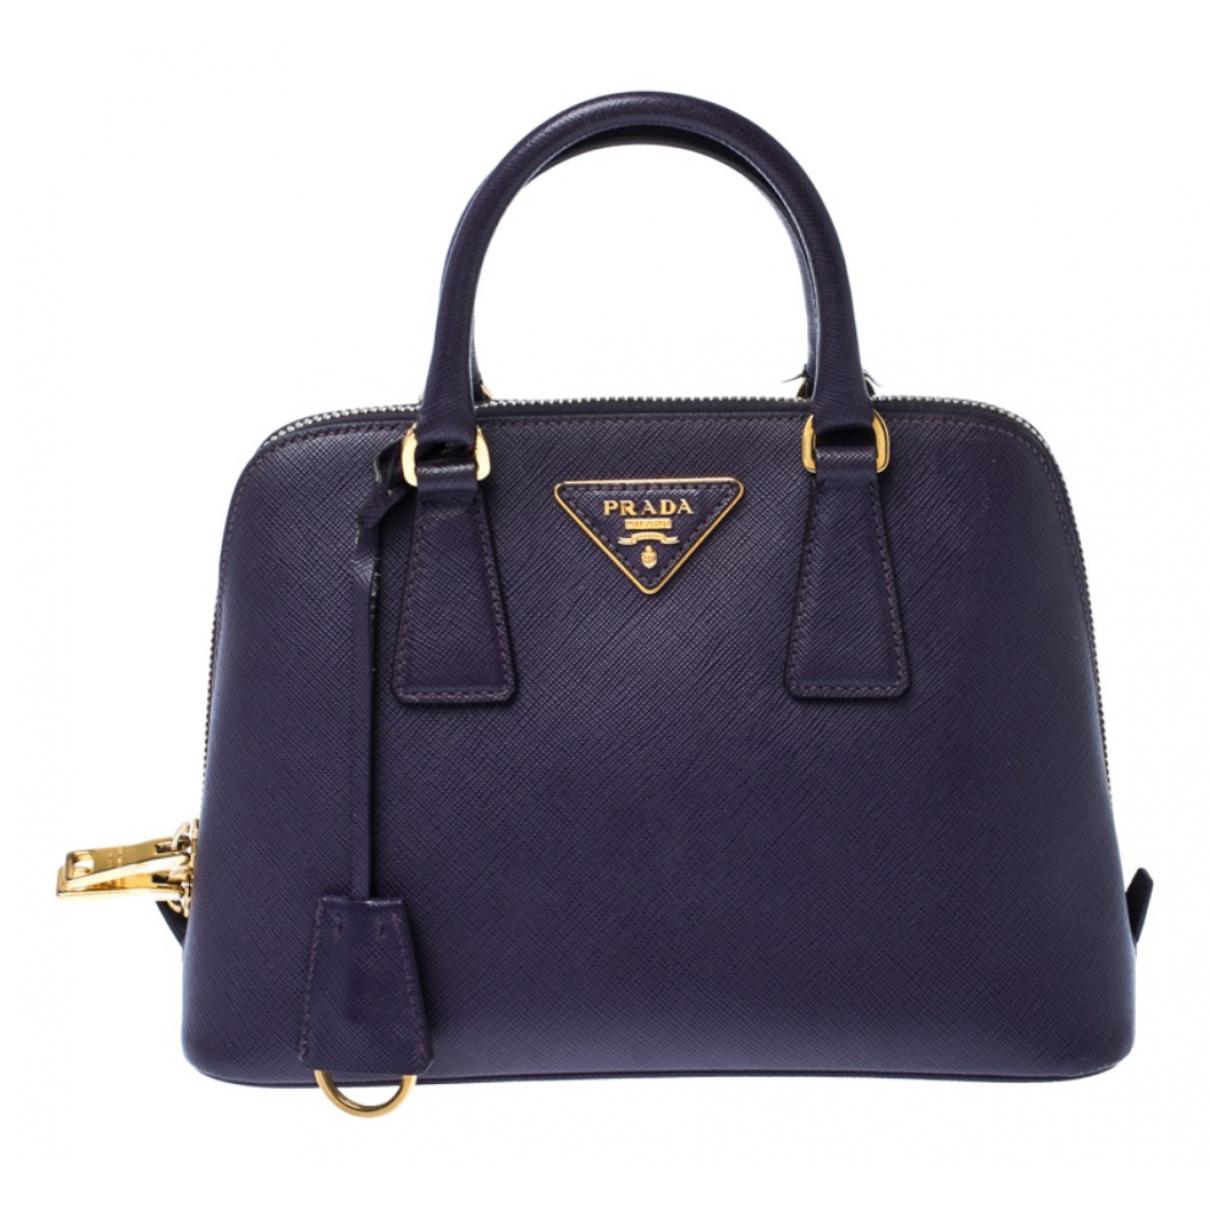 Prada - Sac a main Promenade pour femme en cuir - violet